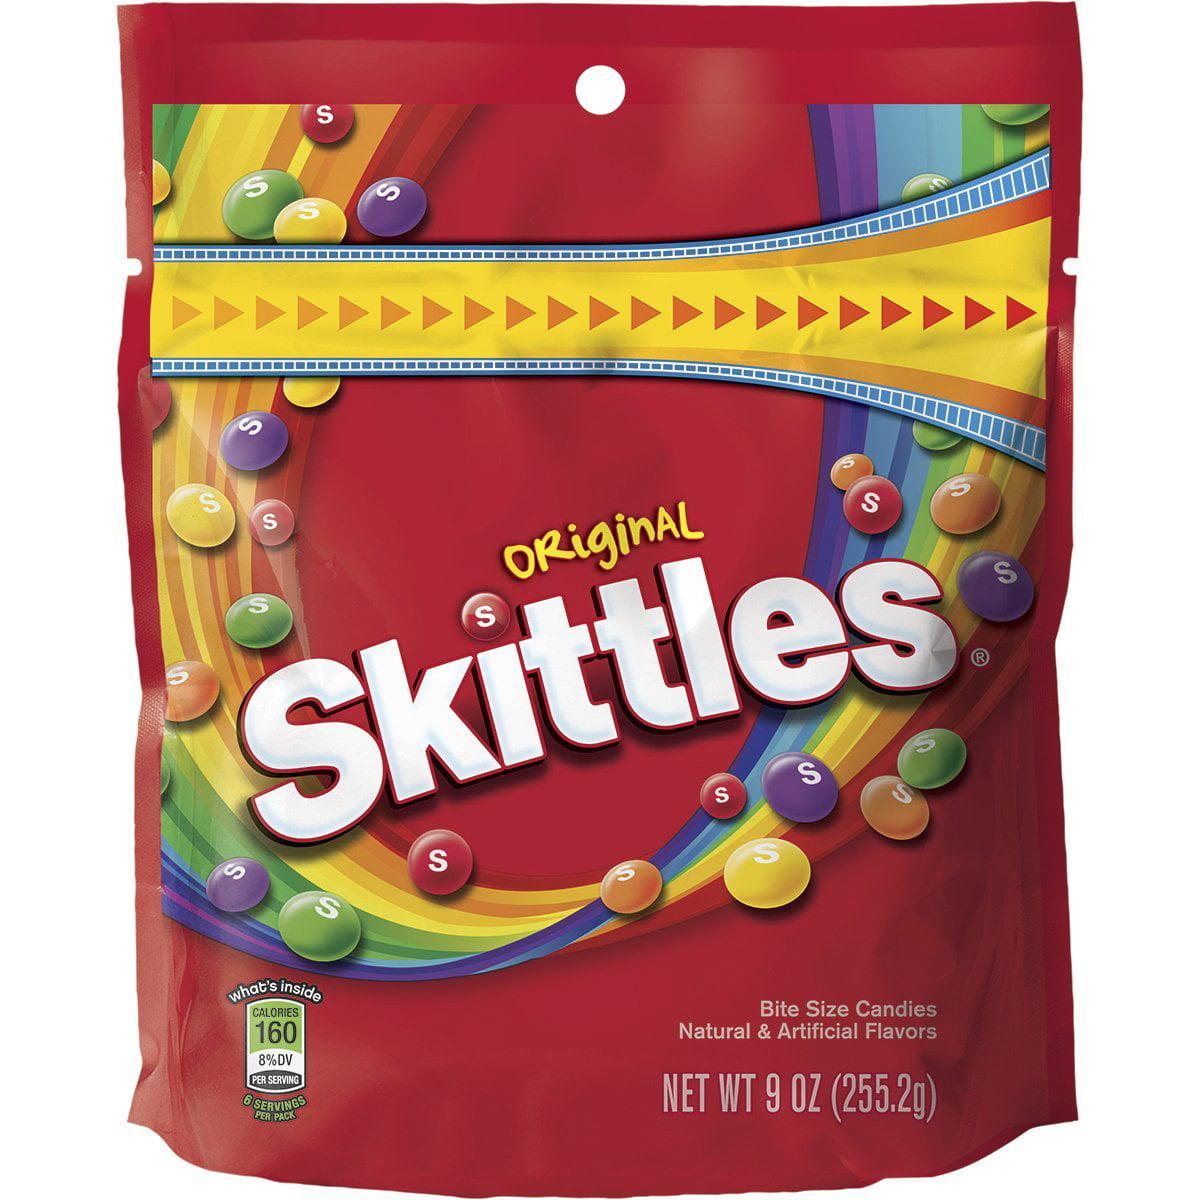 8 PACKS : Skittles Original Candy, 9 ounce bag